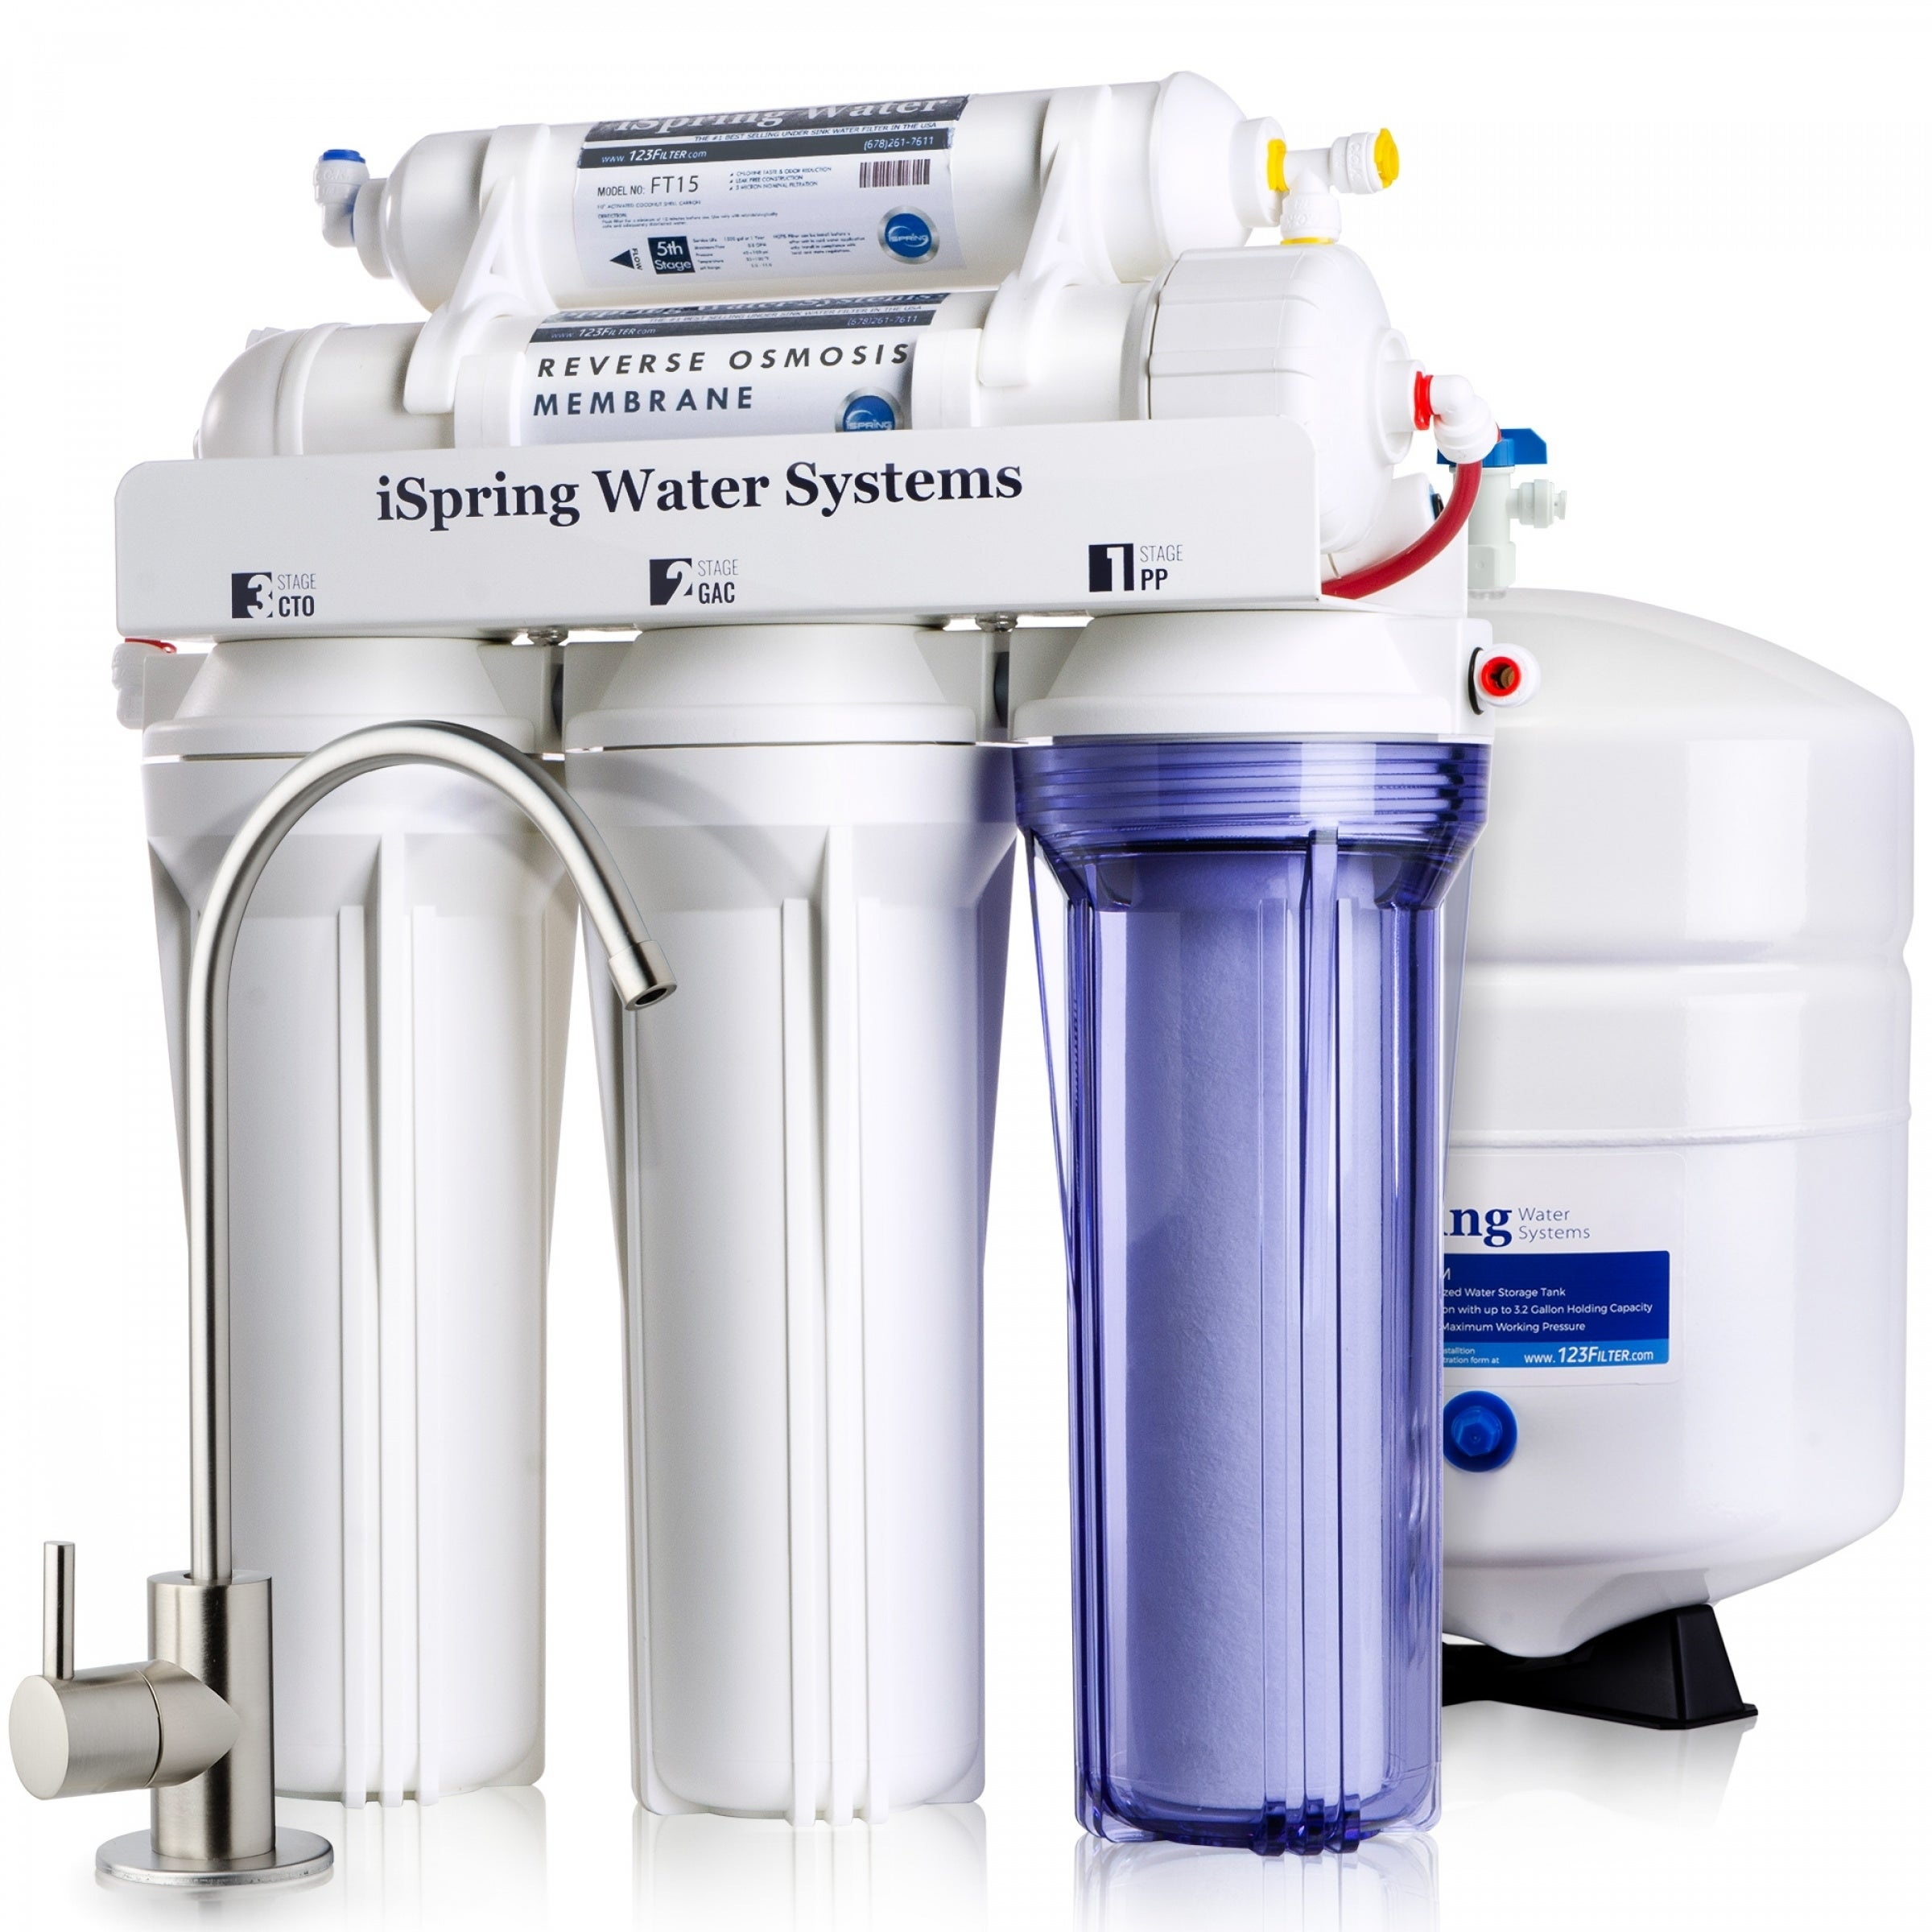 BOANN RO-FIL-4 4Th Stage RO System Membrane Filter